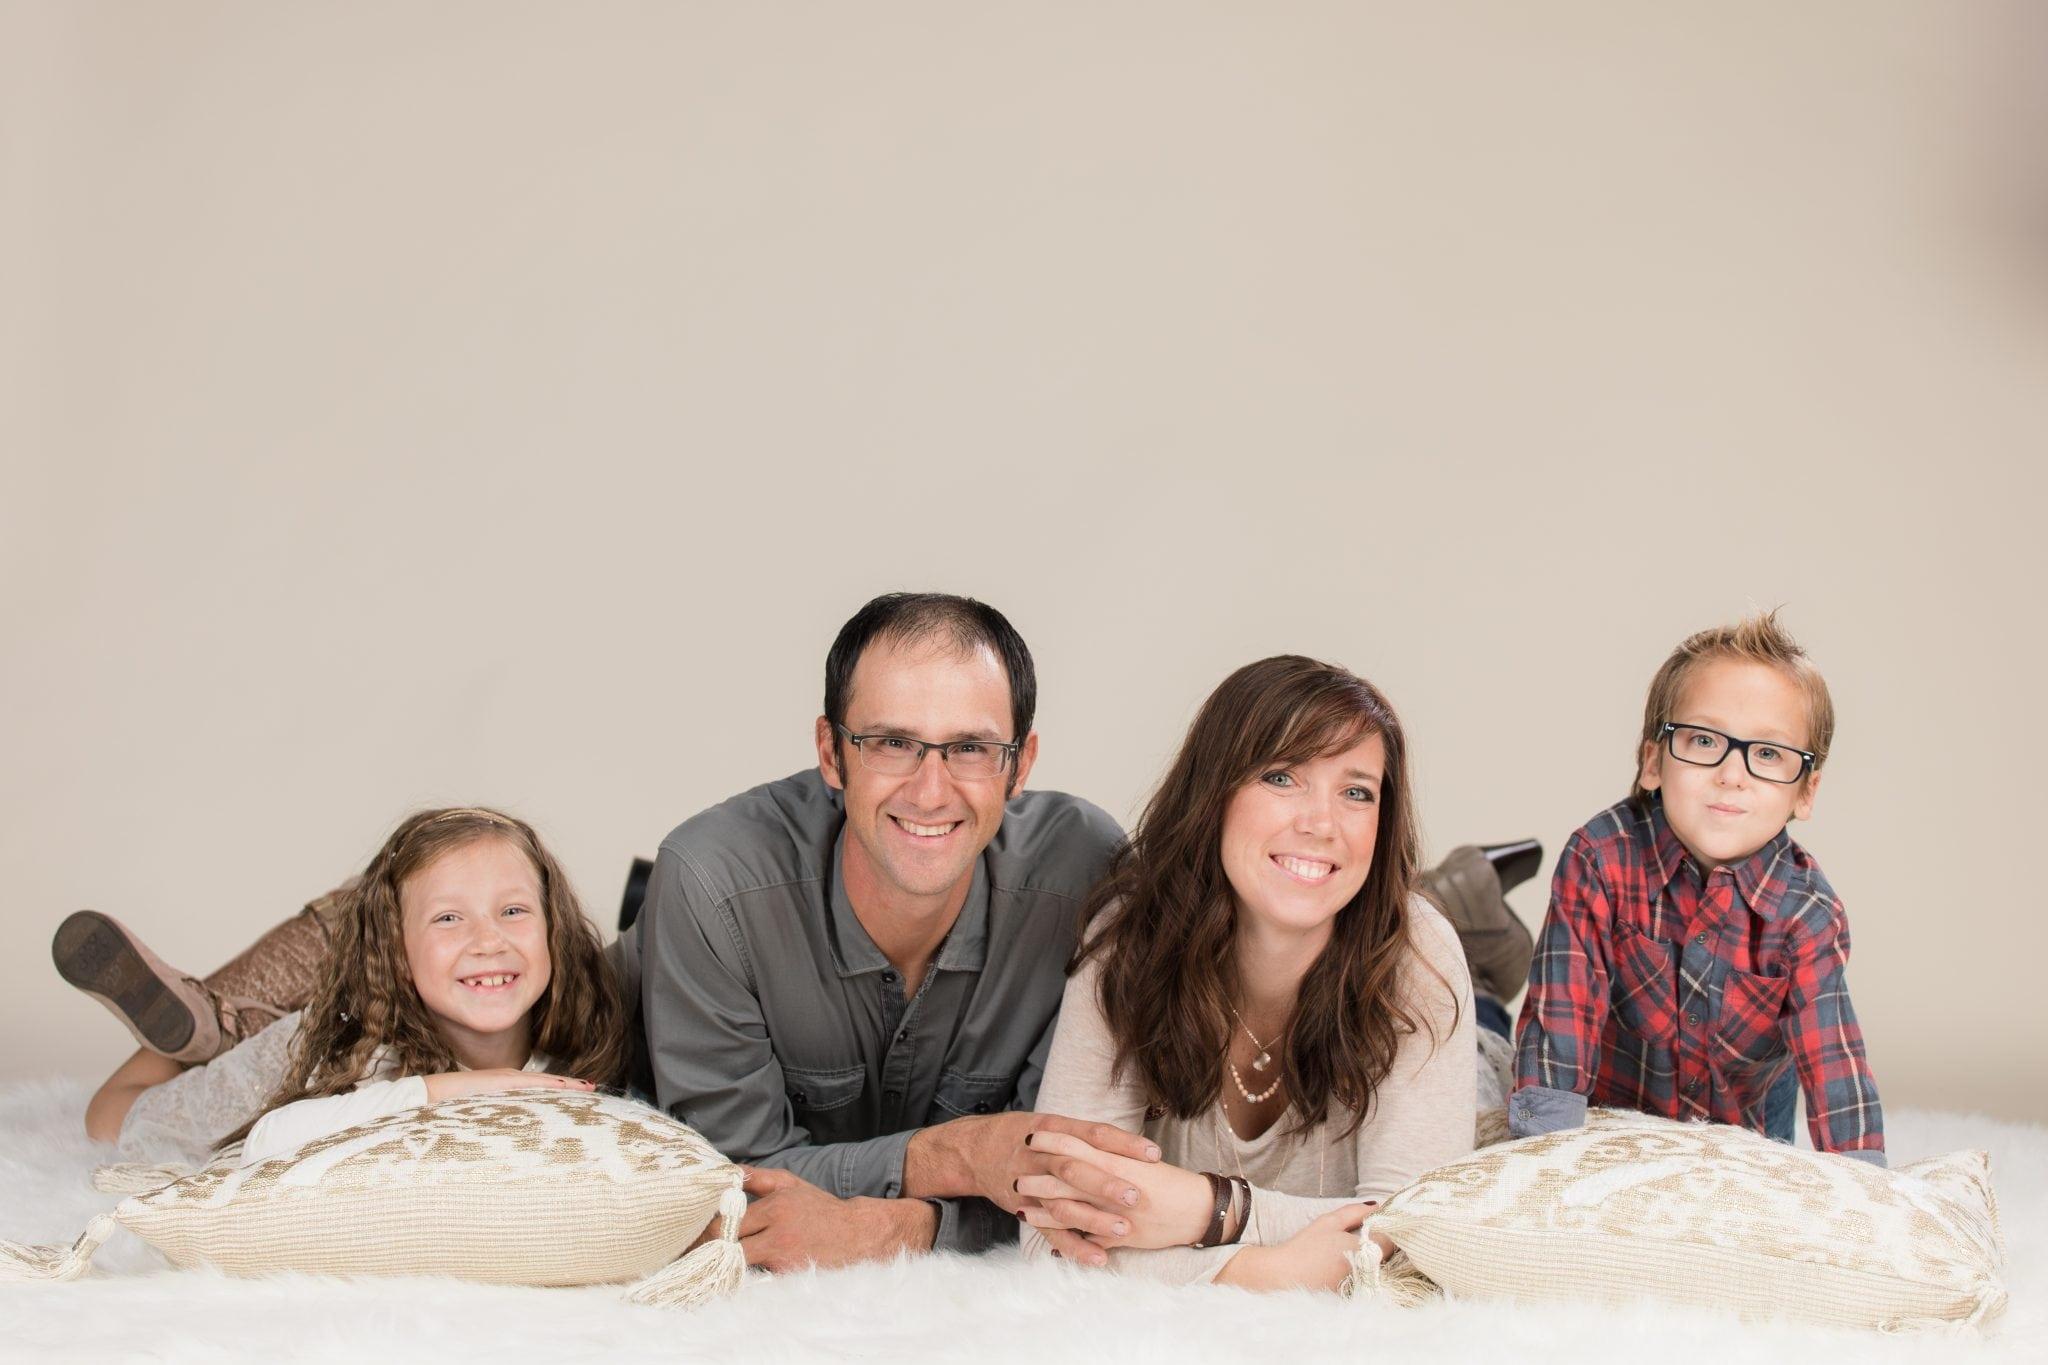 Family Photographer Berks County PA Studio